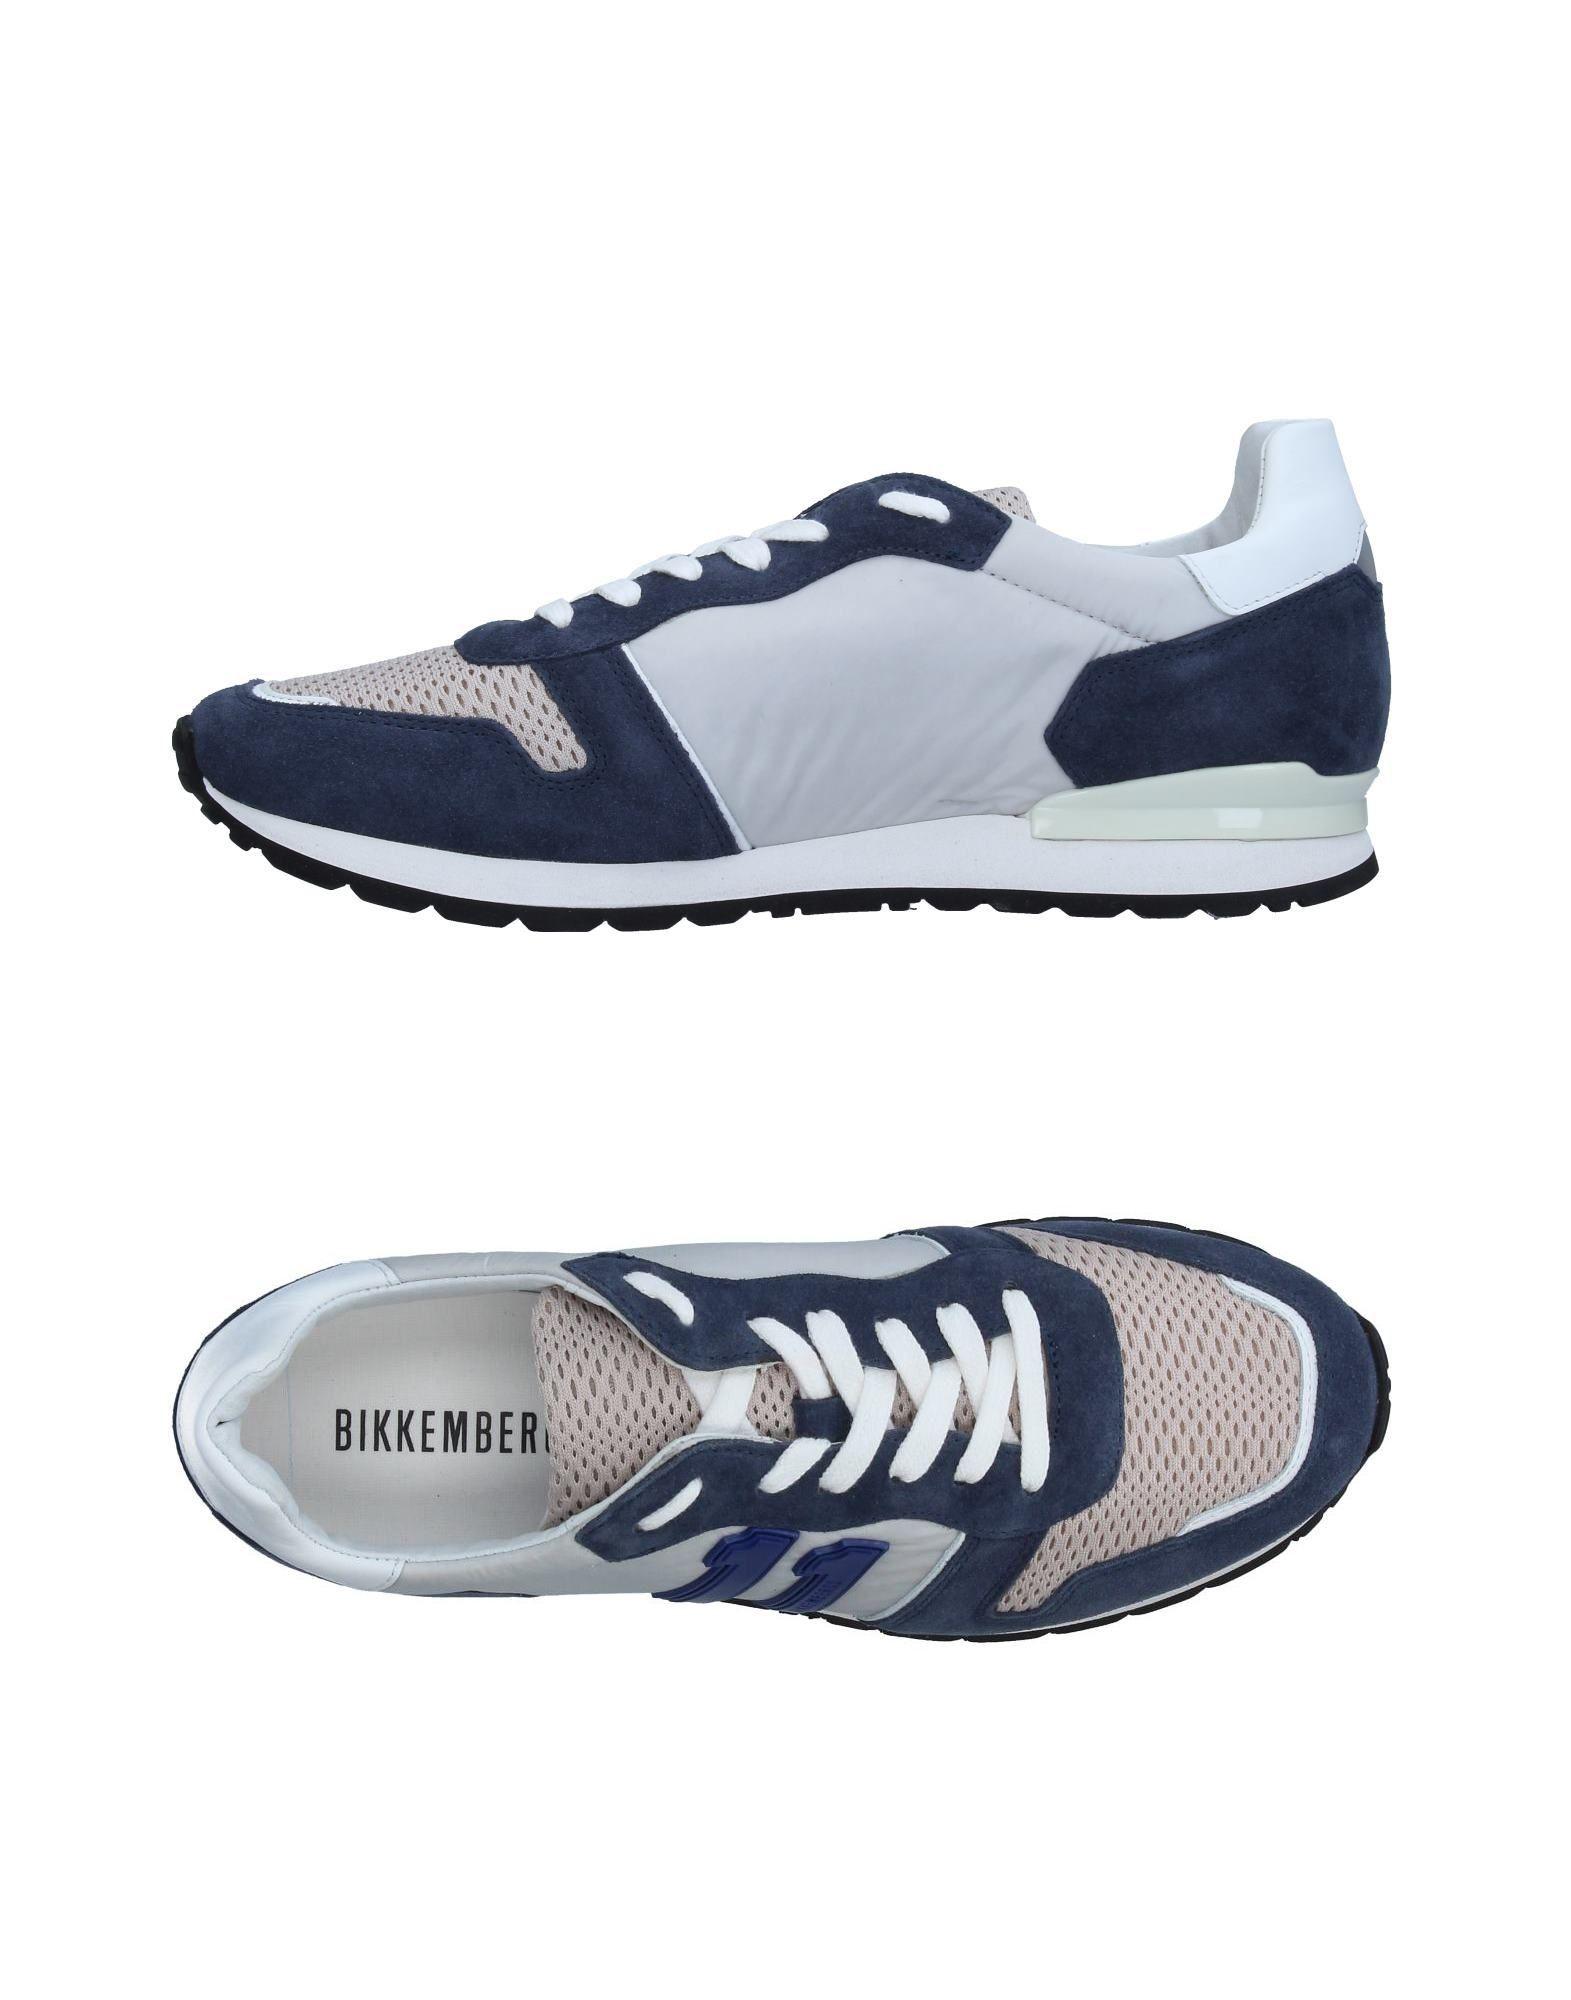 Moda Sneakers Bikkembergs Uomo - 11332236IU